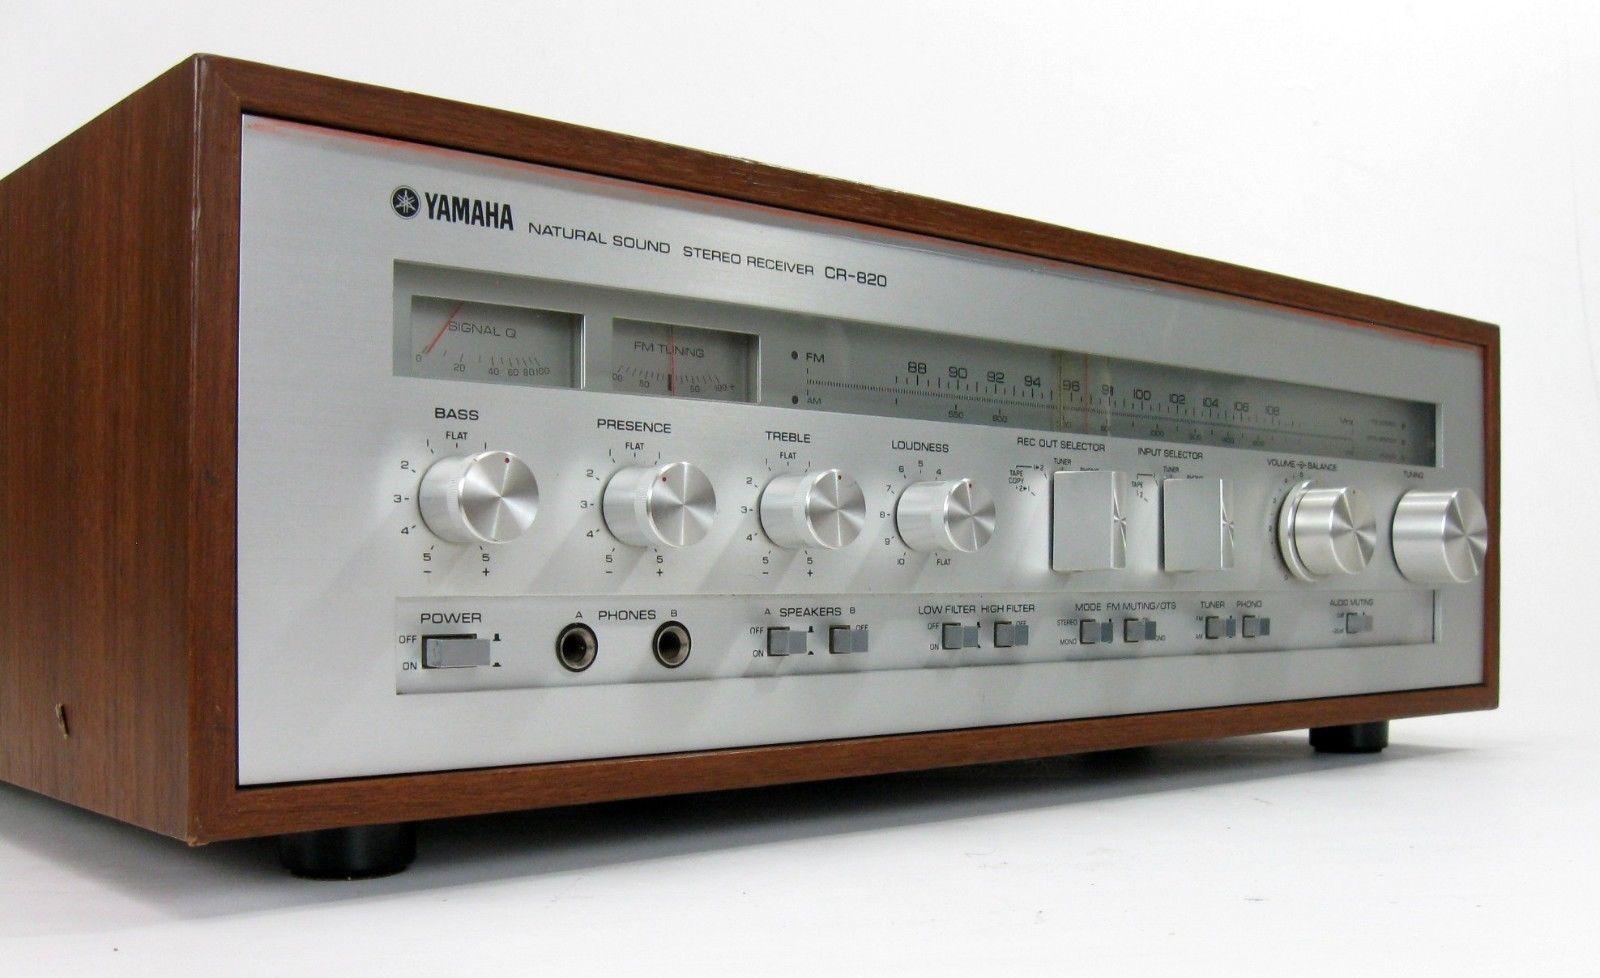 Yamaha CR 820 Vintage Stereo Receiver 55 WPC TLC   eBay